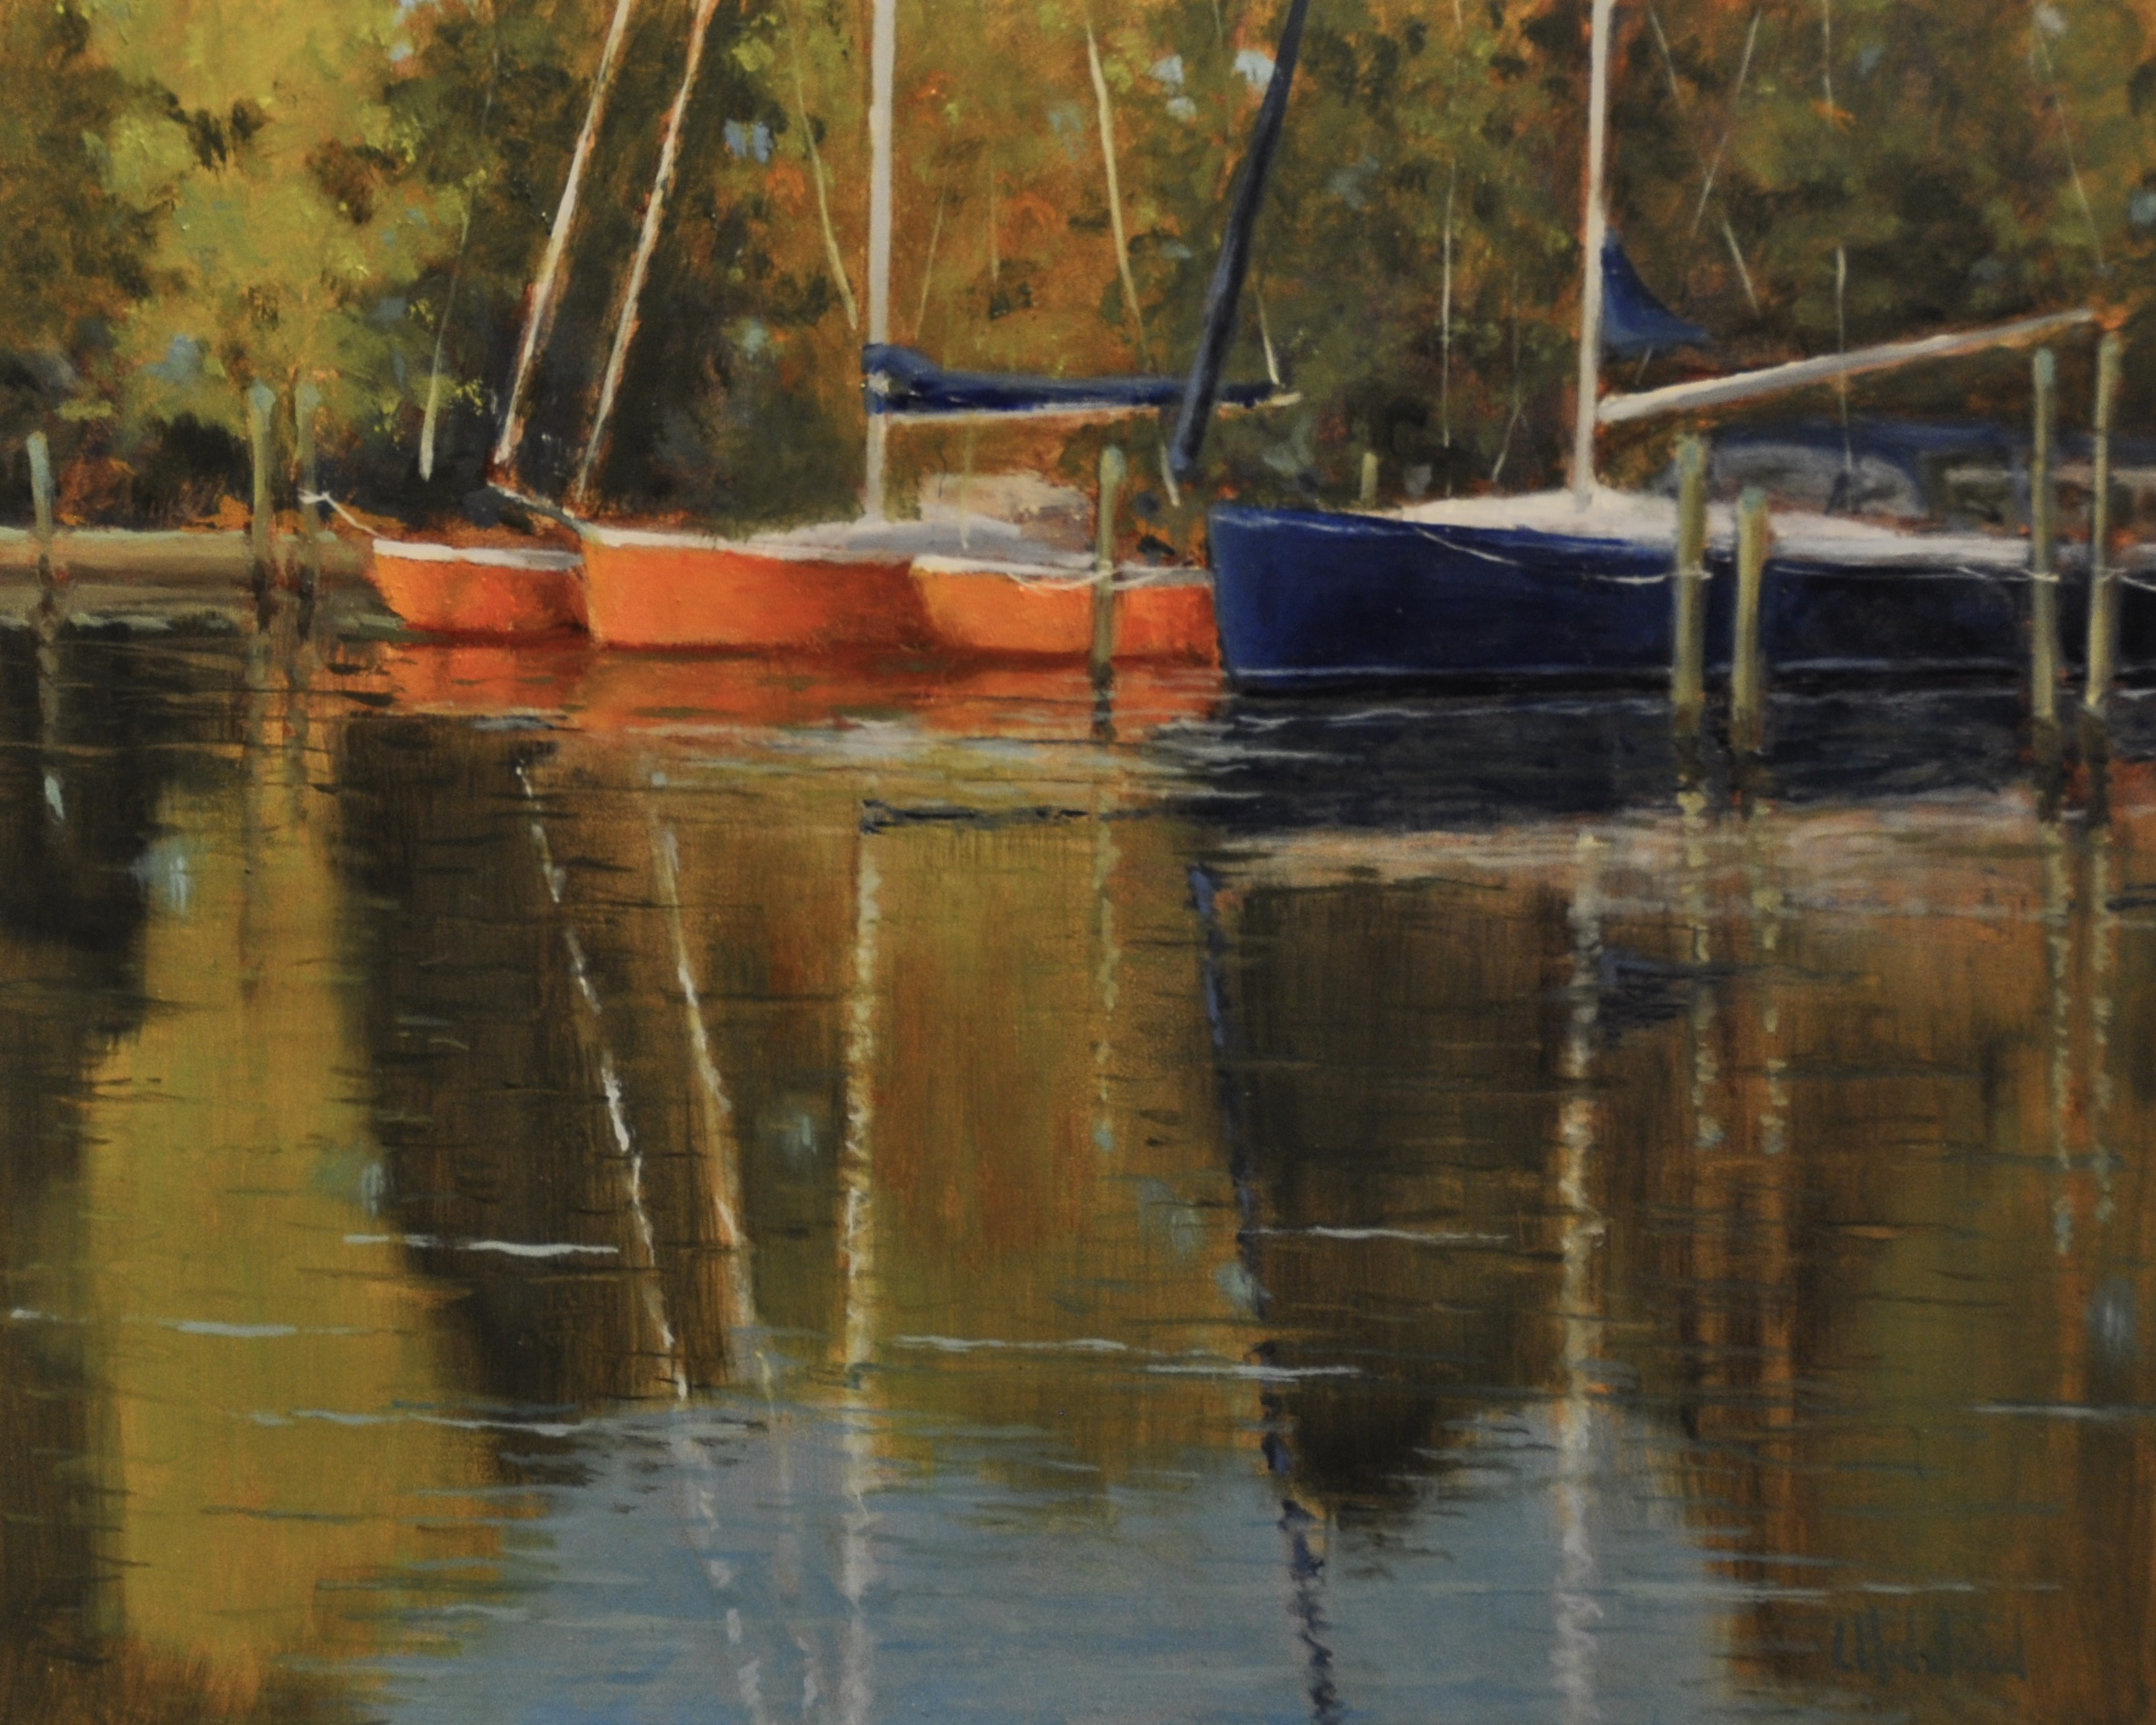 Still Reflecting, Oil on Linen, 8 x 10, sold